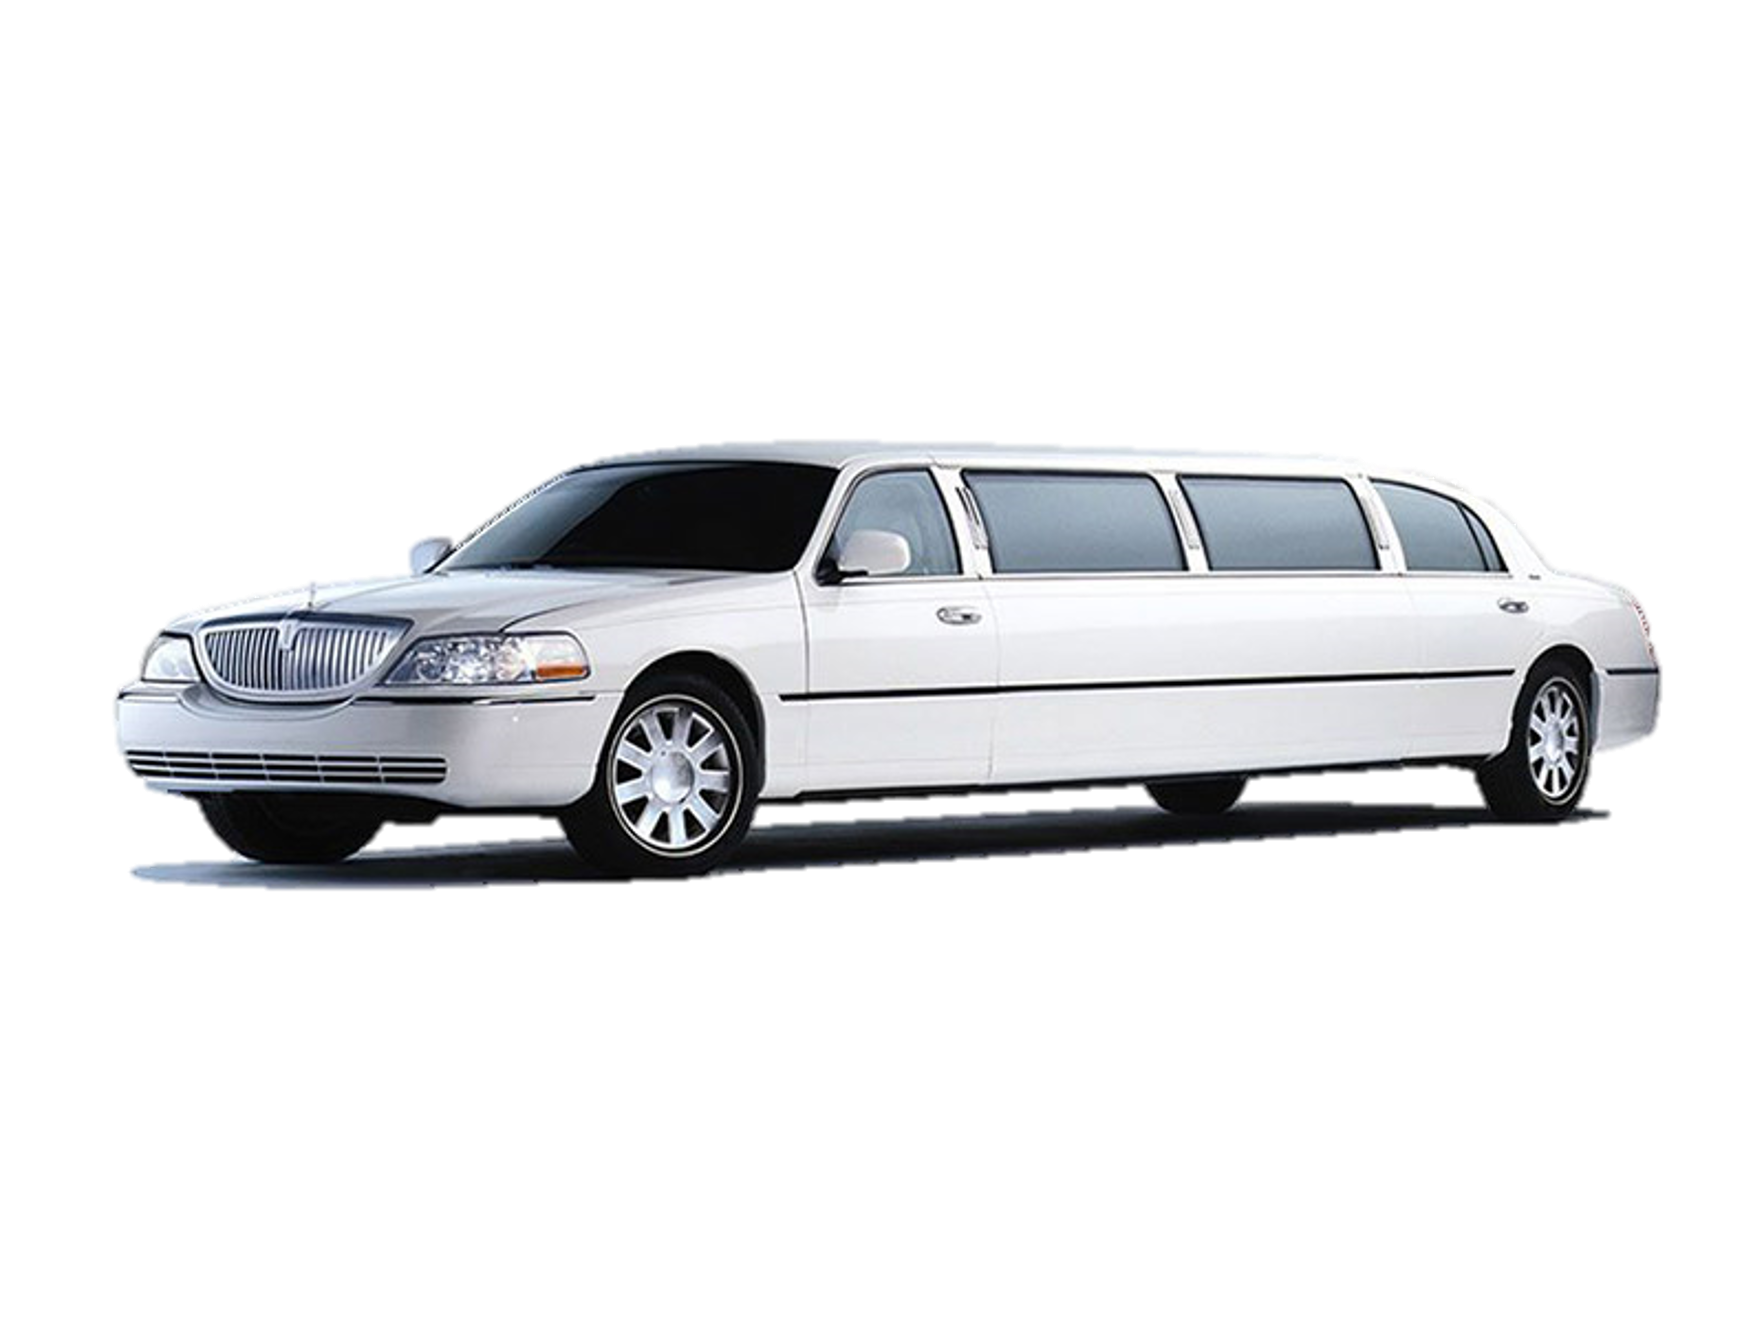 SJ Limo Stretch Limousines